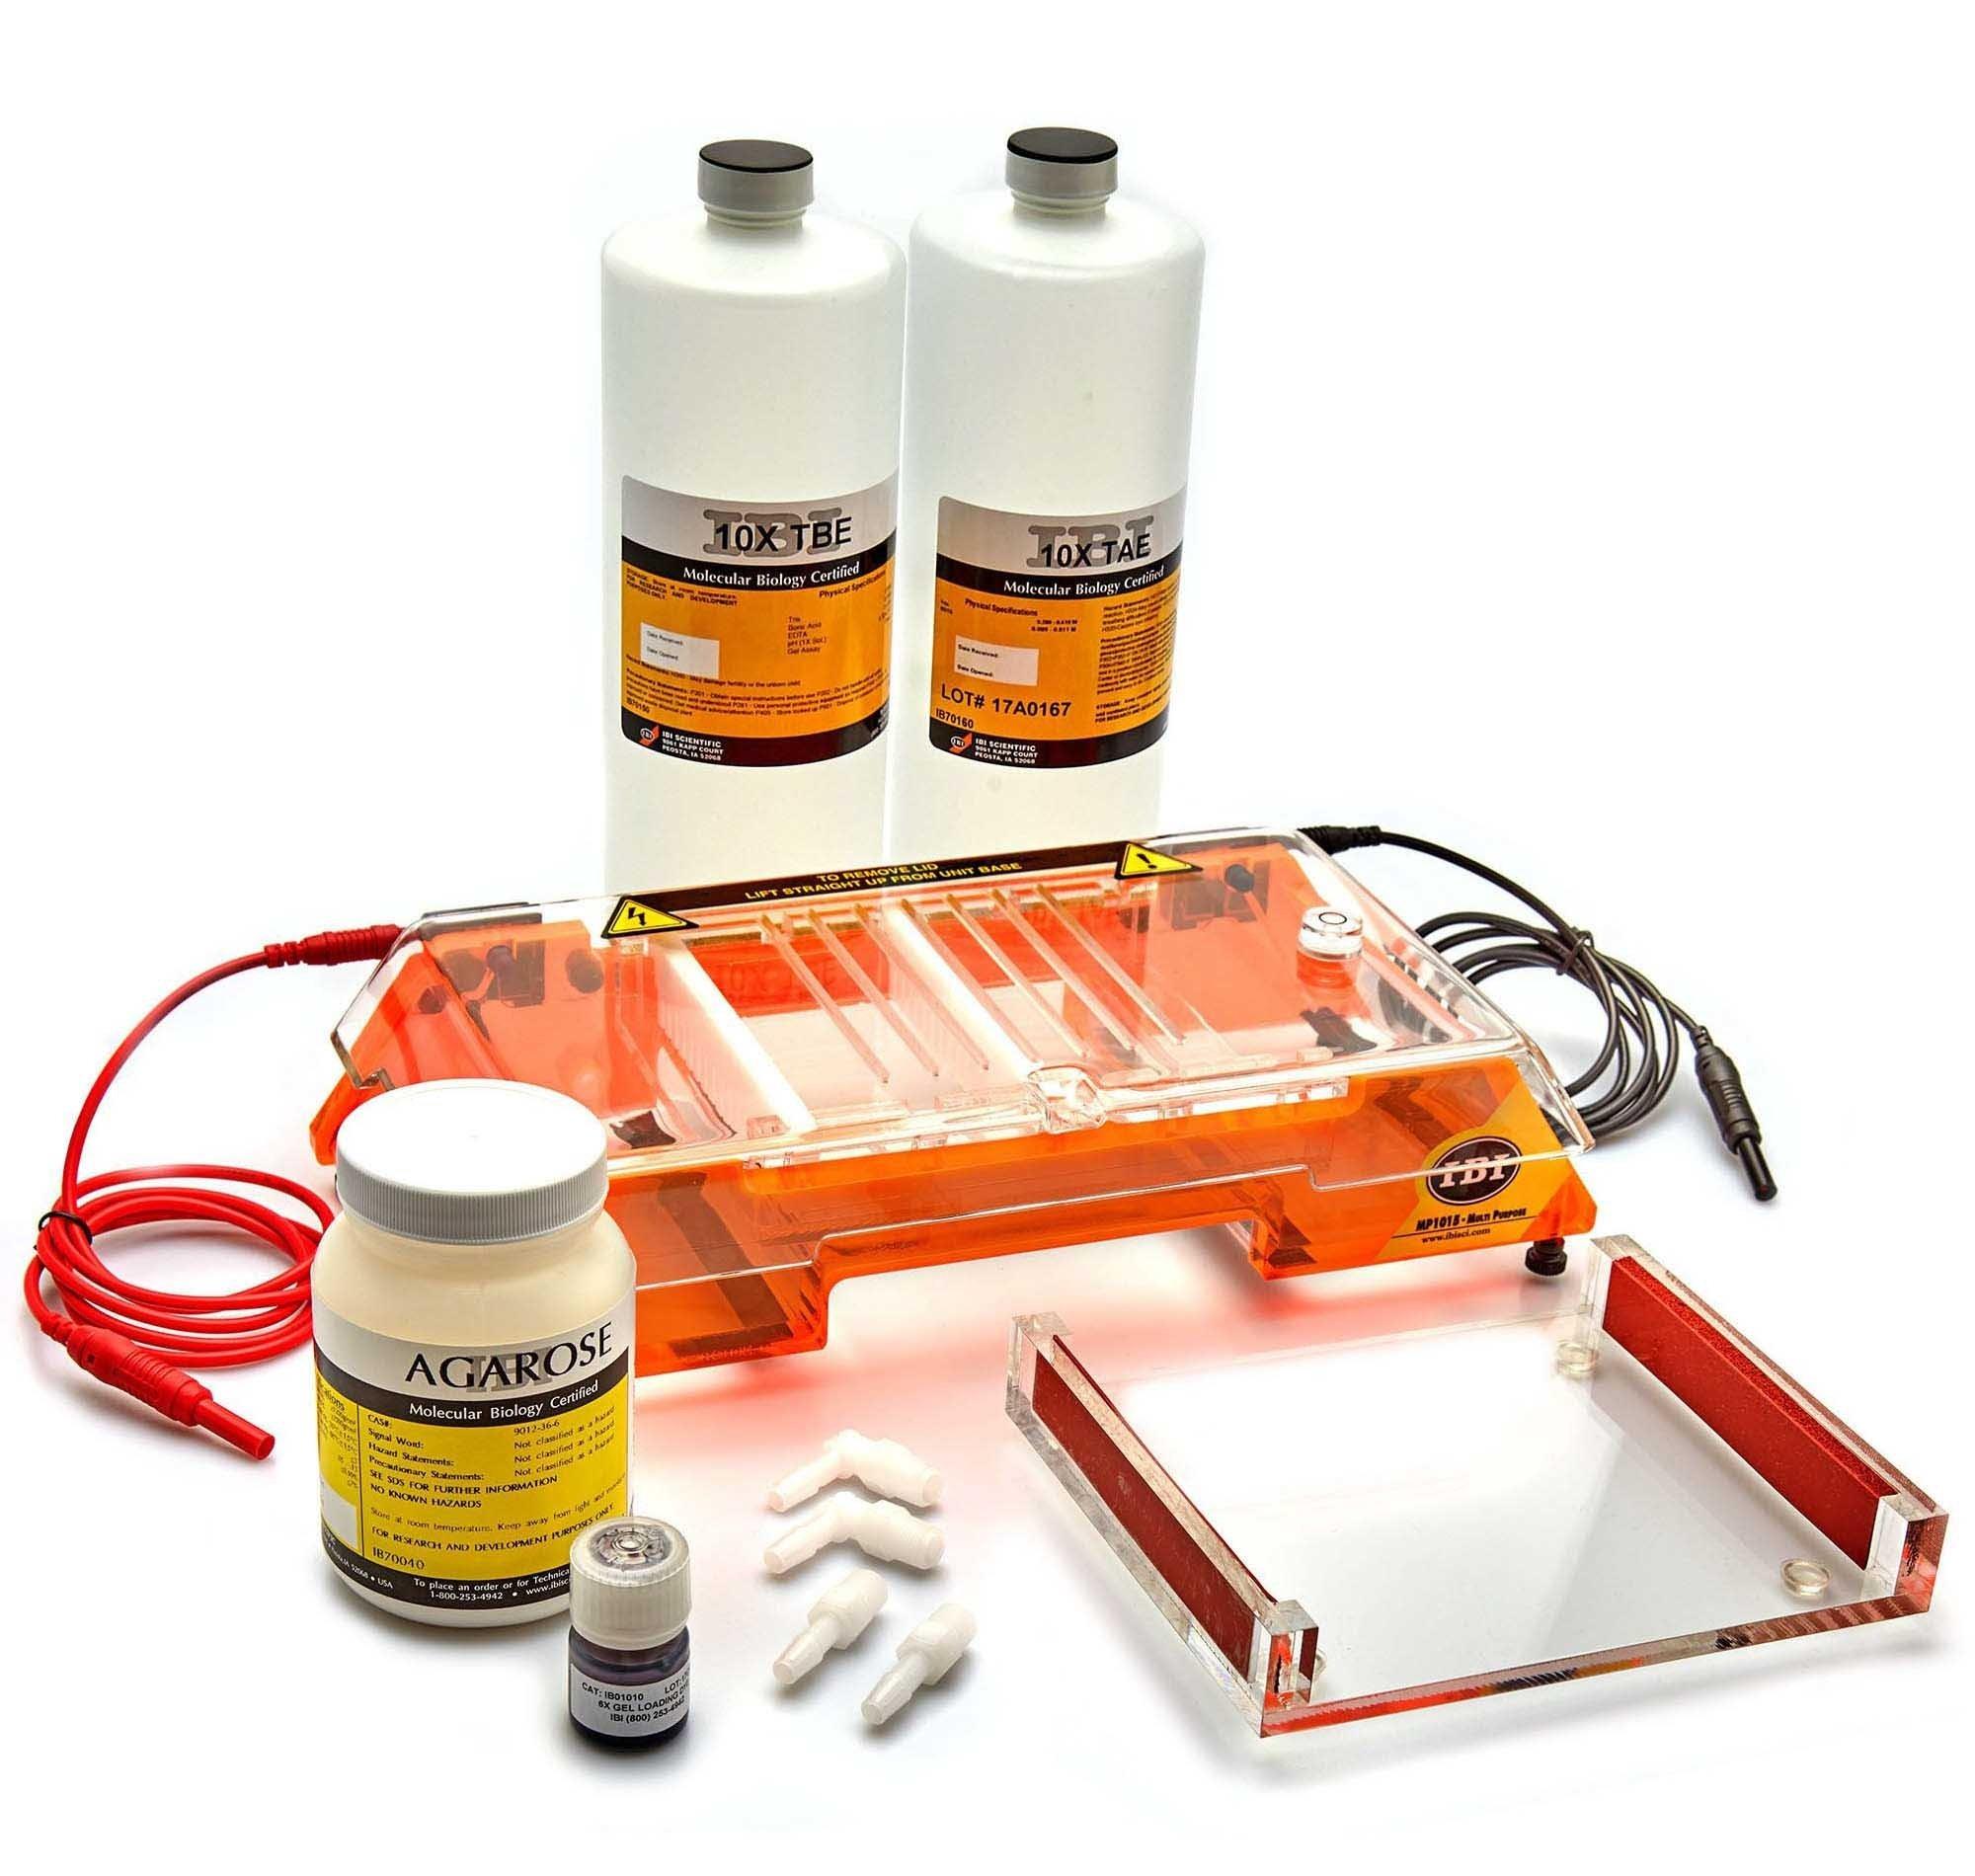 IBI Scientific MP-1015 DNA Lab Start-Up Kit